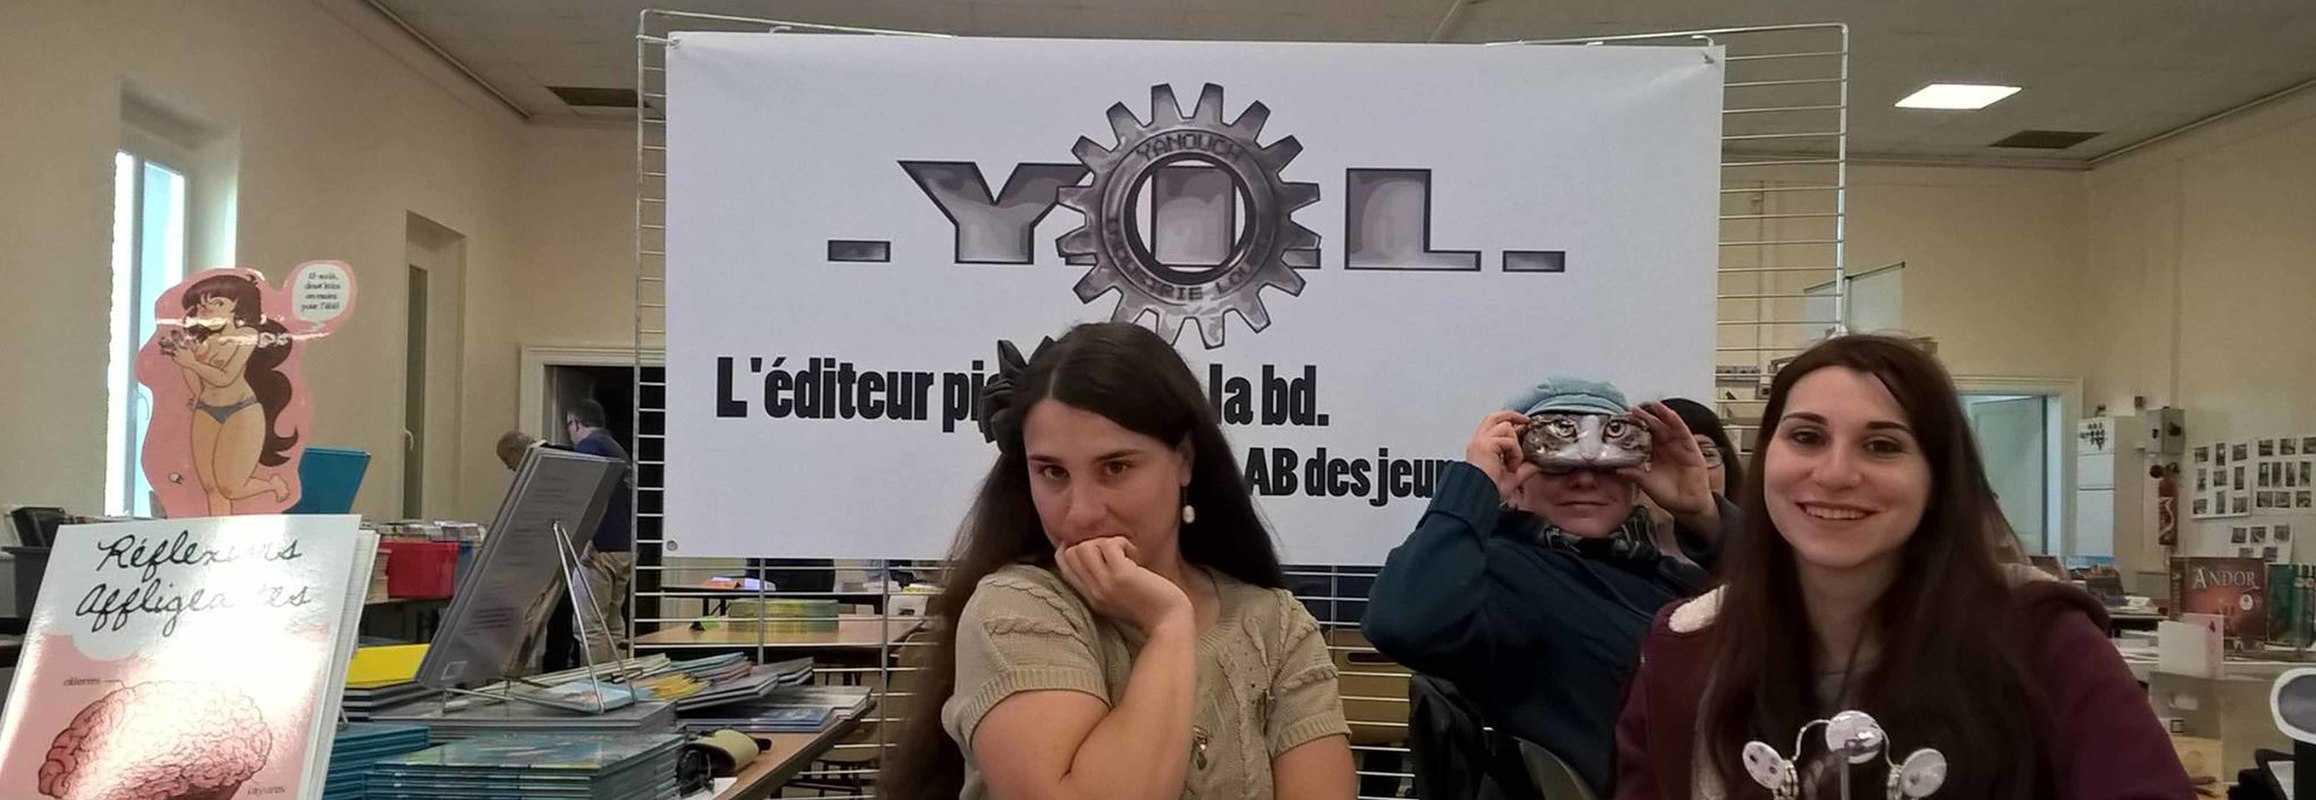 yyyyy-copie copie